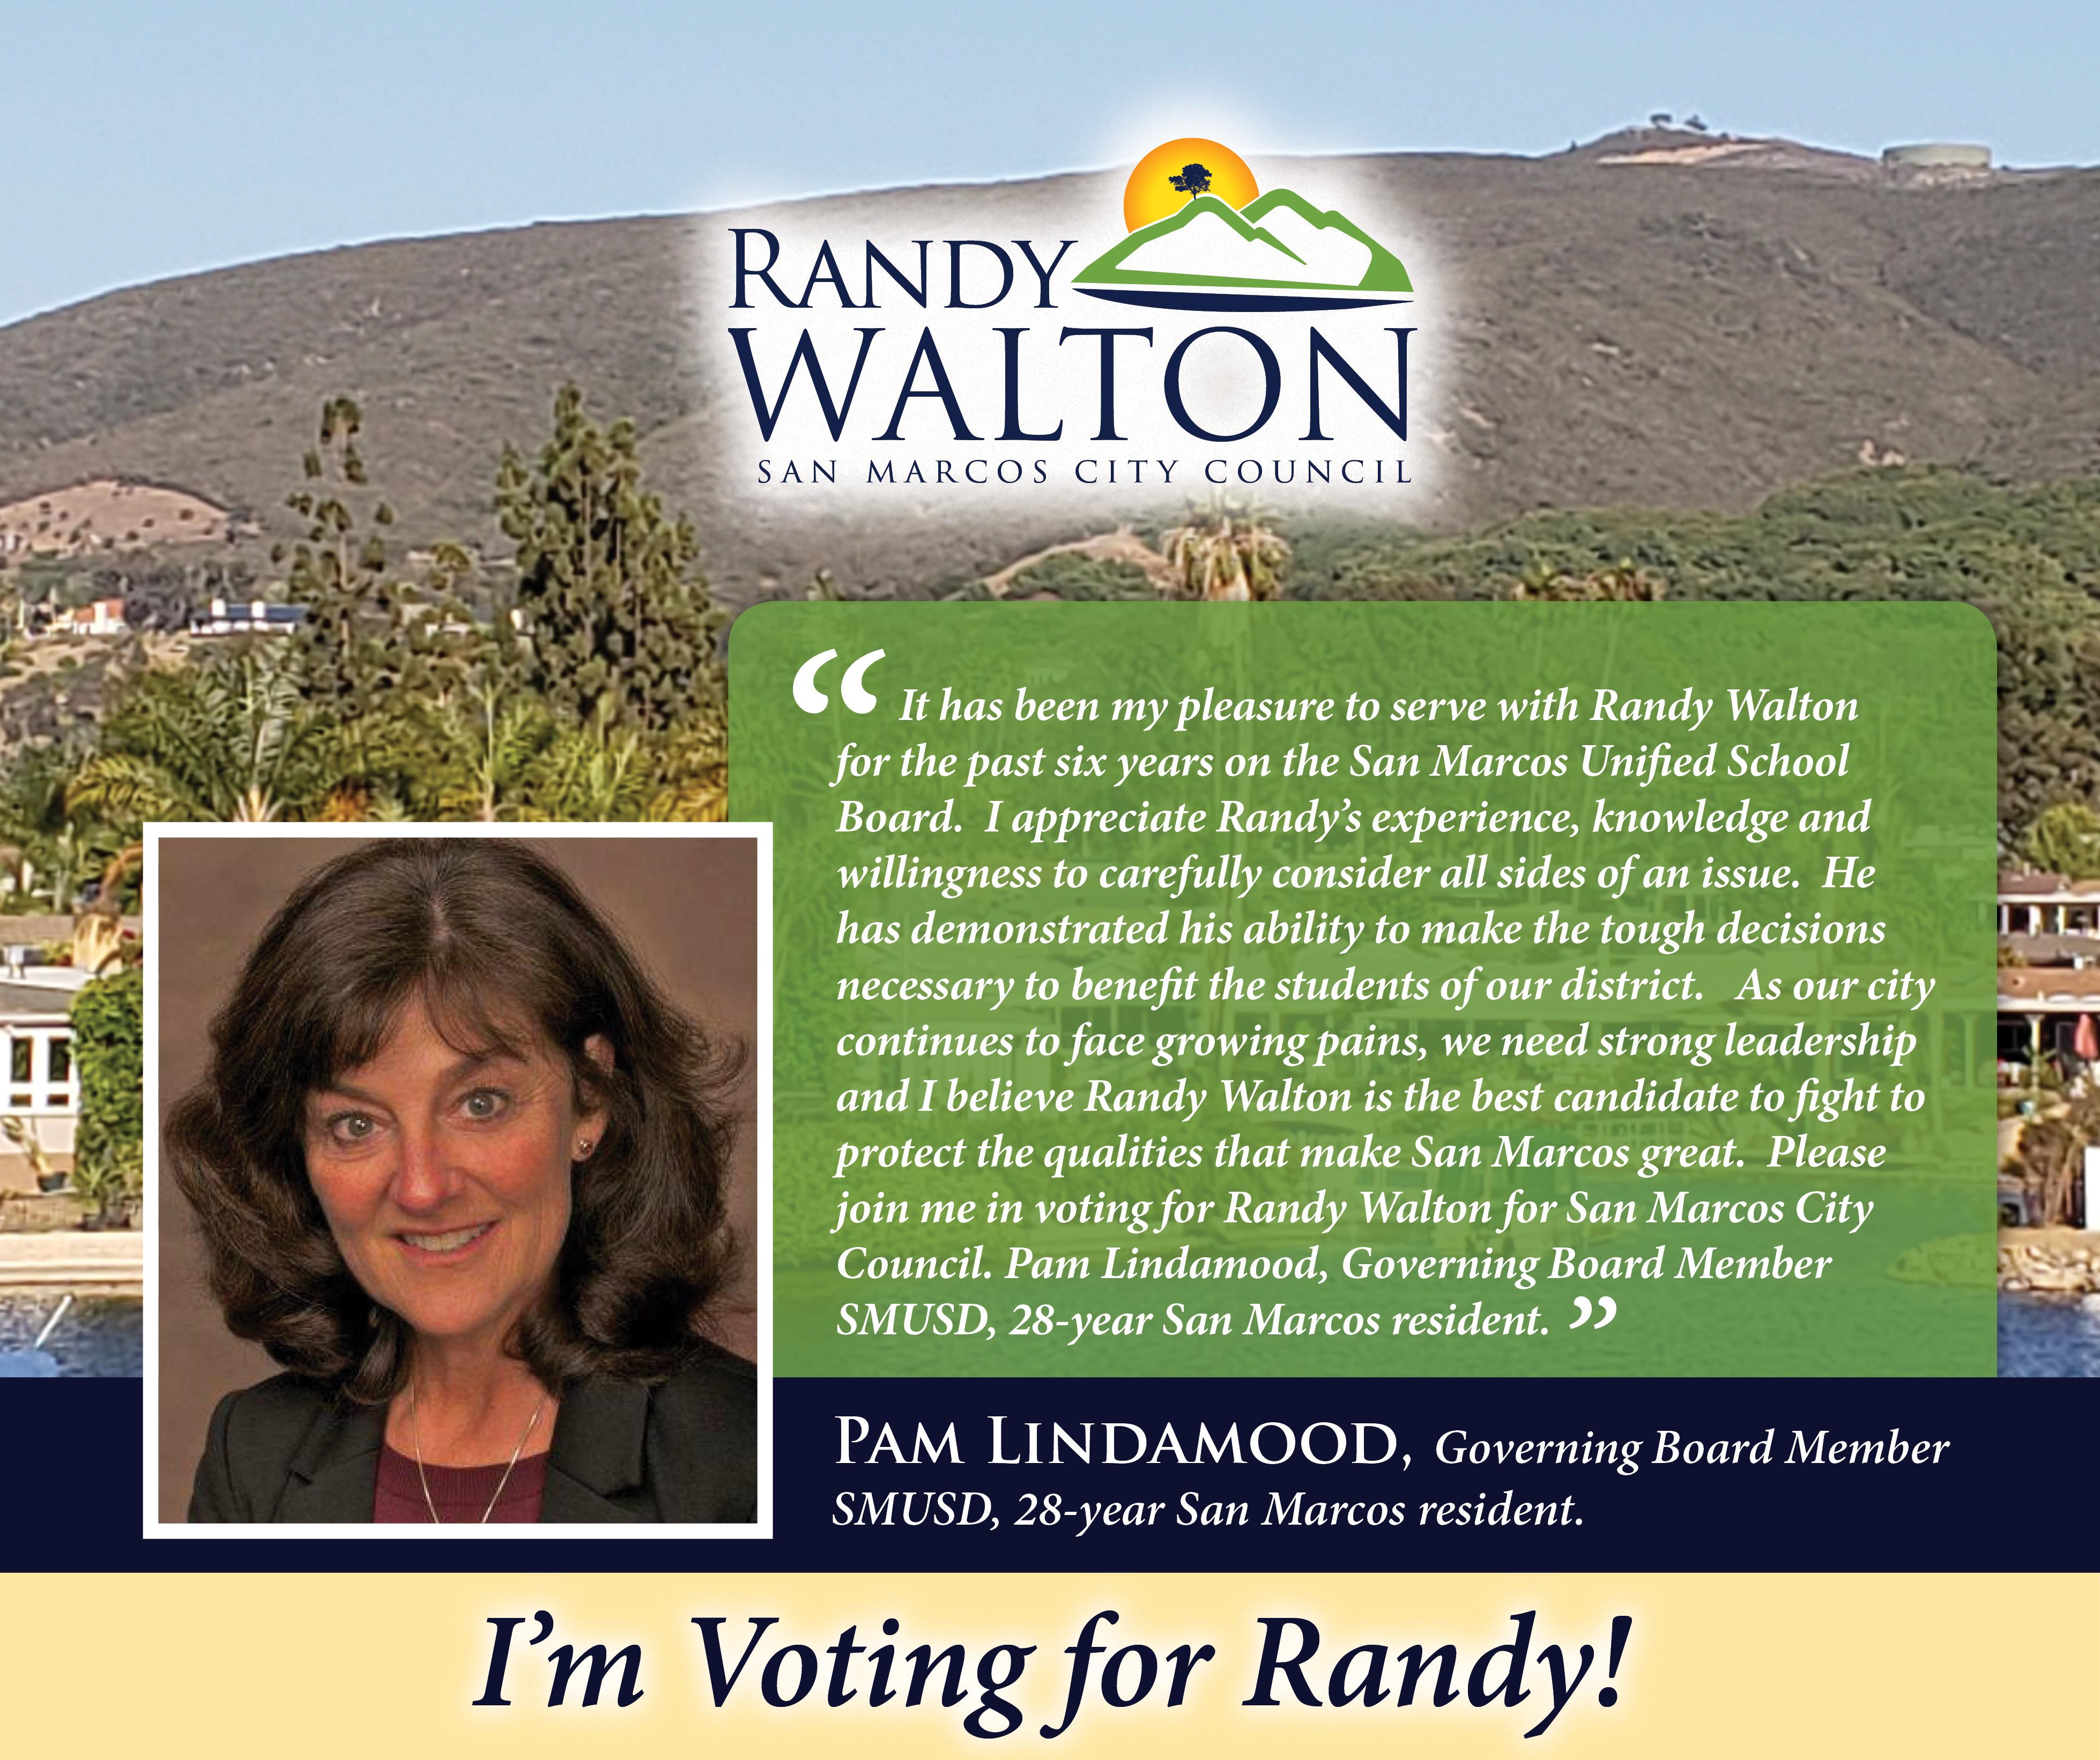 Pam Lindamood